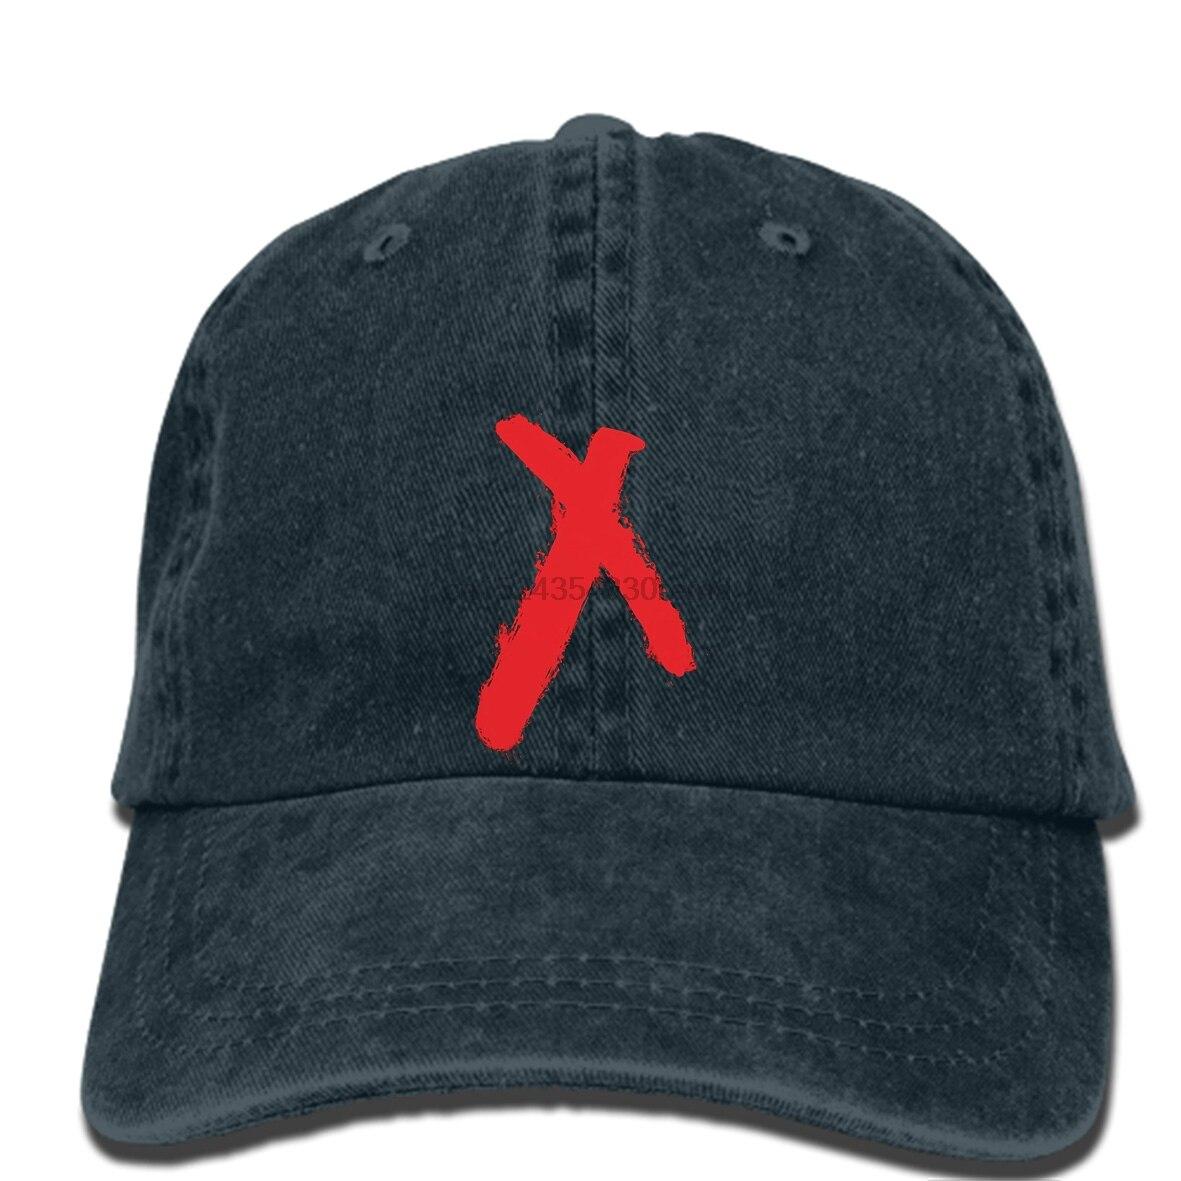 hip hop Baseball caps Printed Men hat Xenogears Women cap